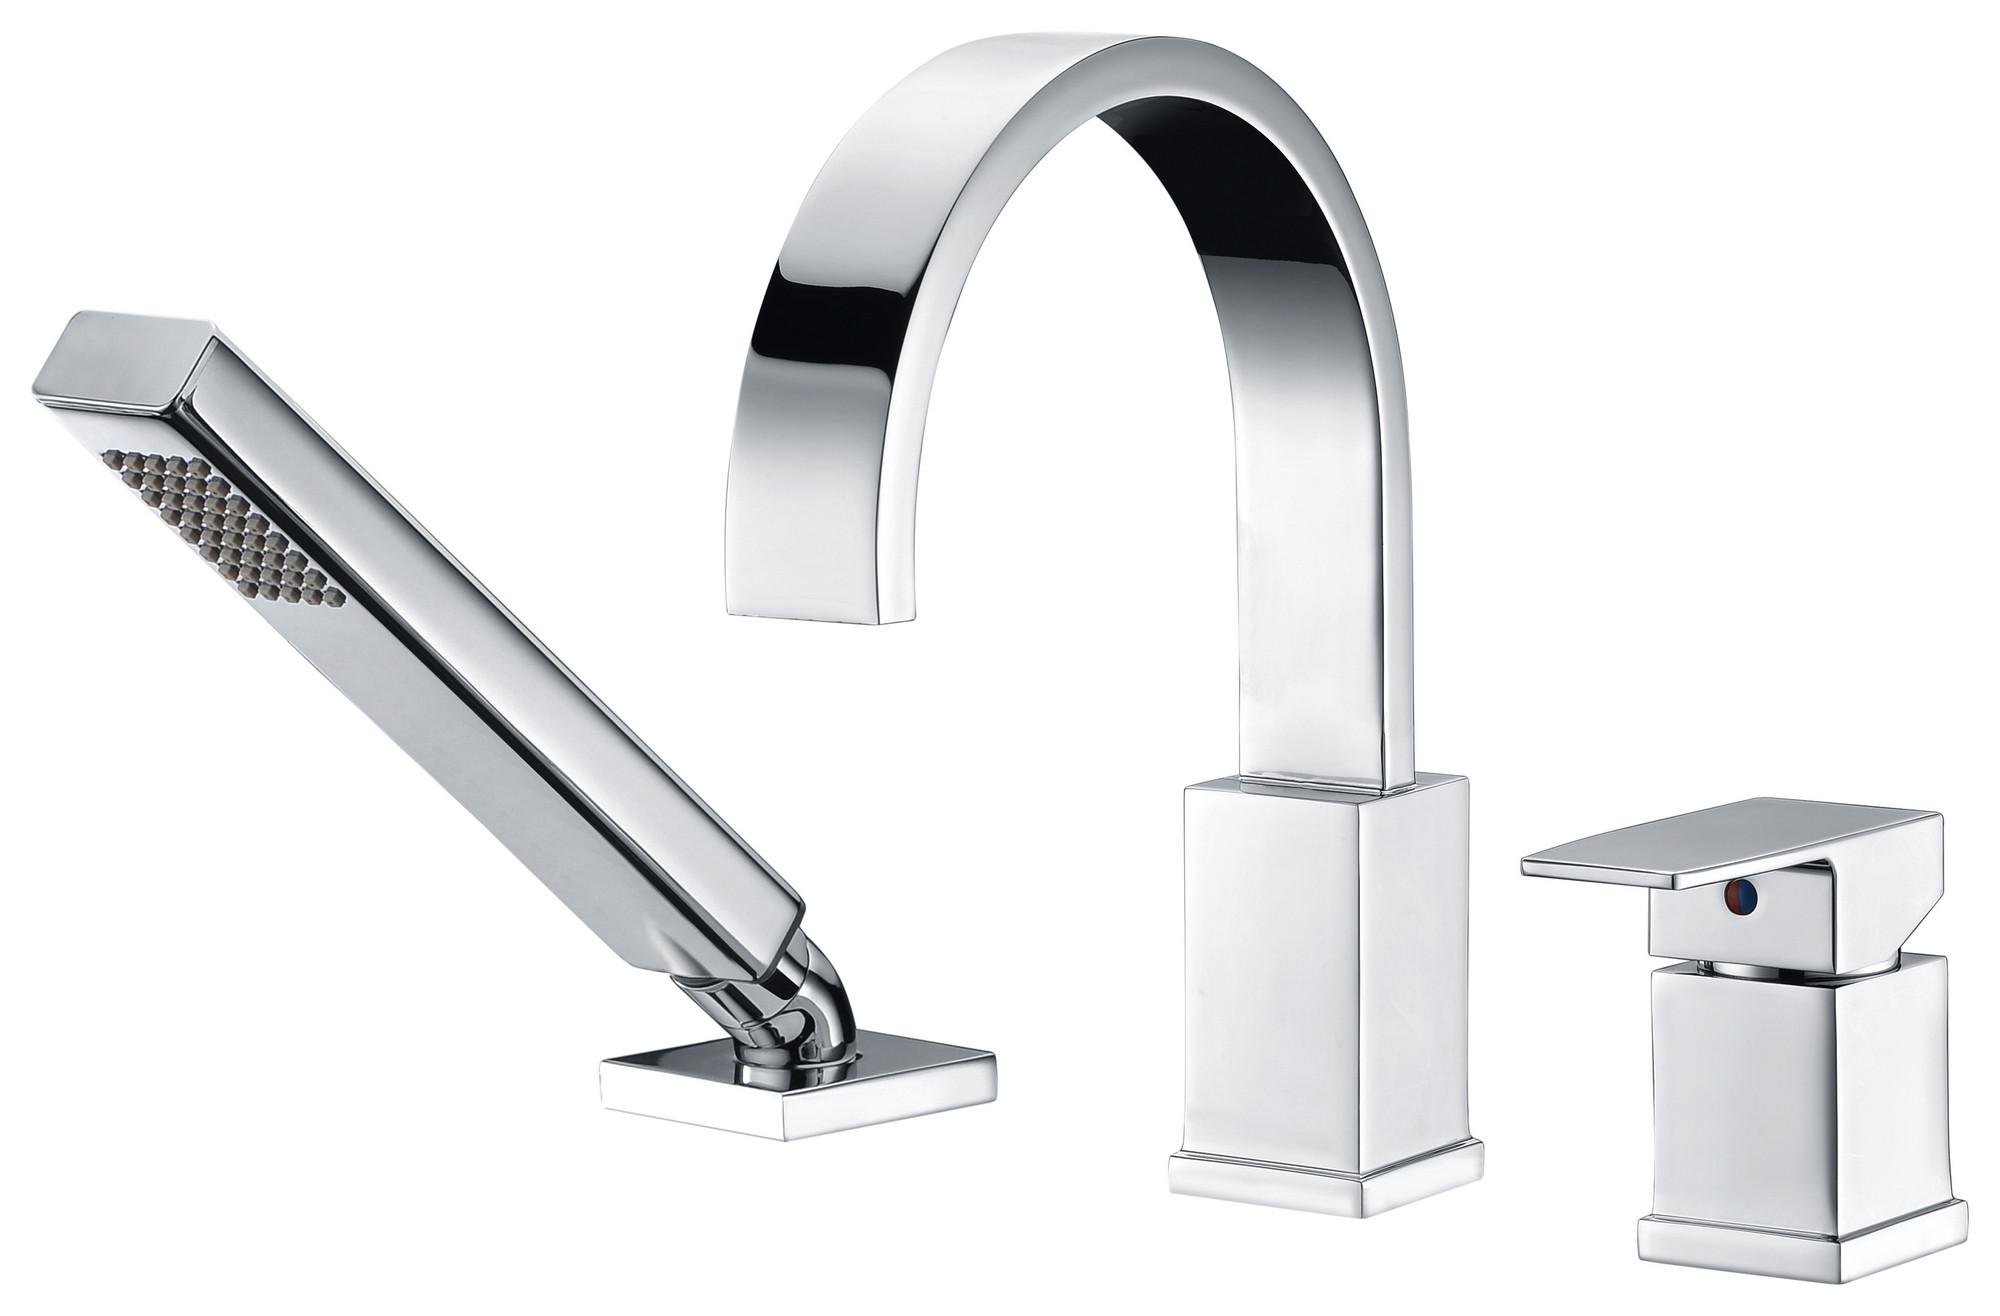 ANZZI FR-AZ473 Polished Chrome Nite Roman Tub Faucet With Handheld Sprayer